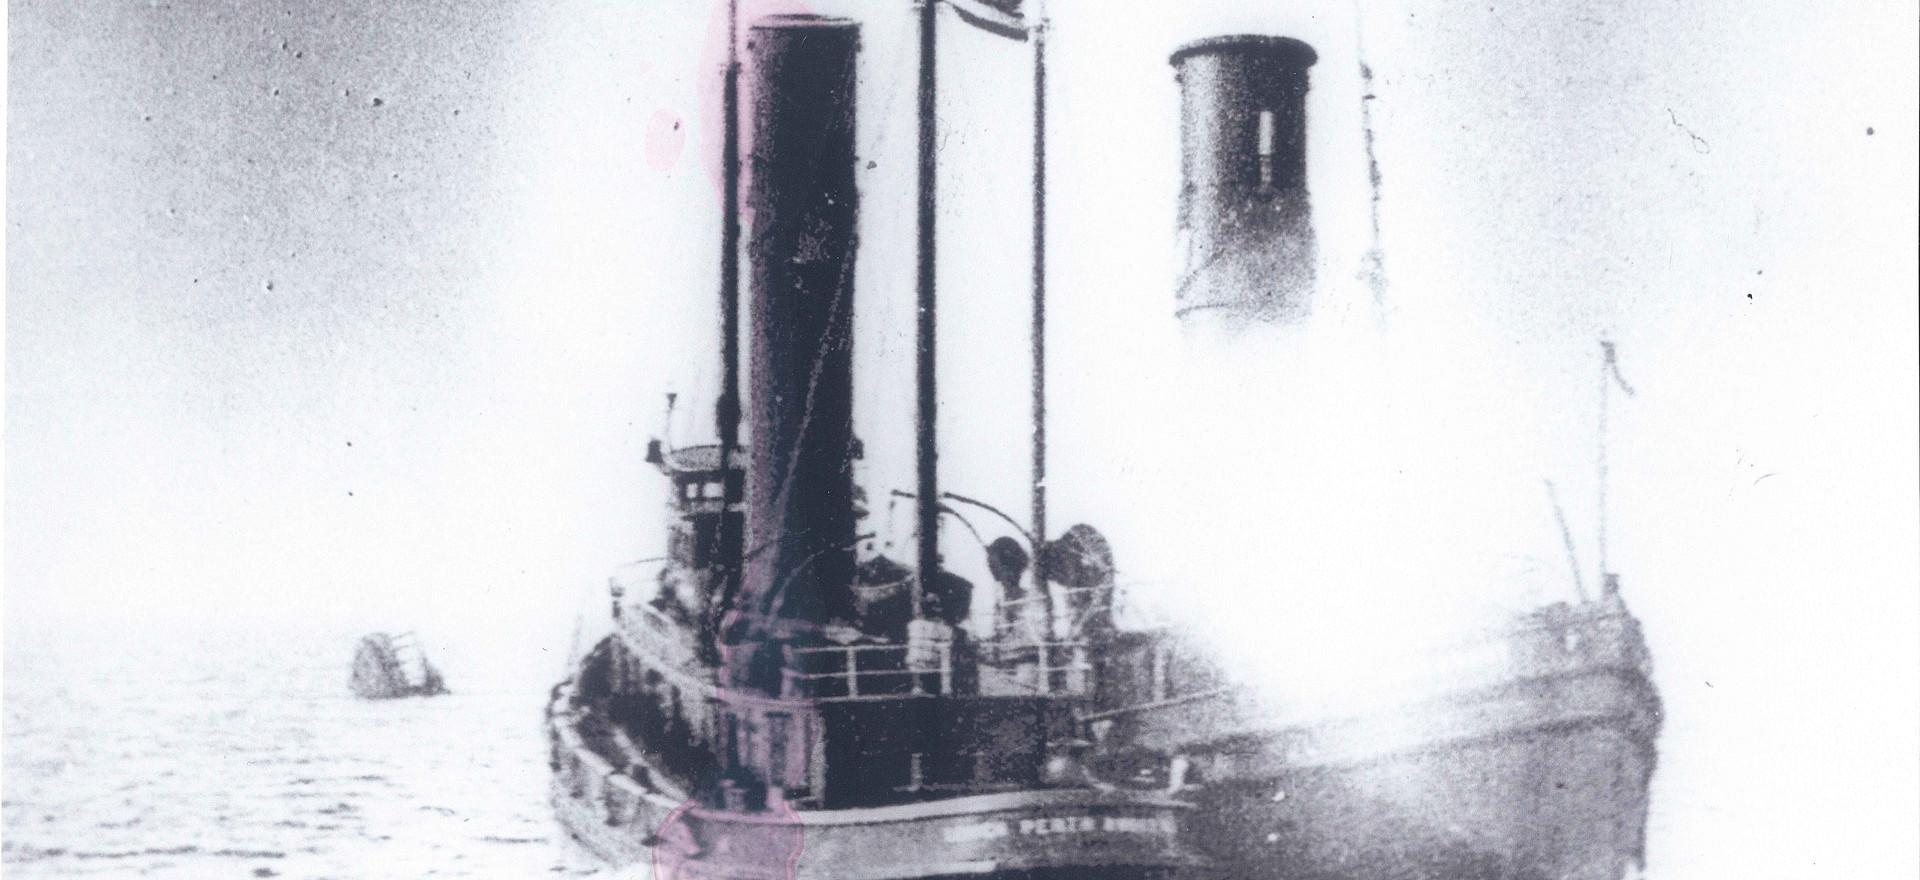 The Perth Amboy